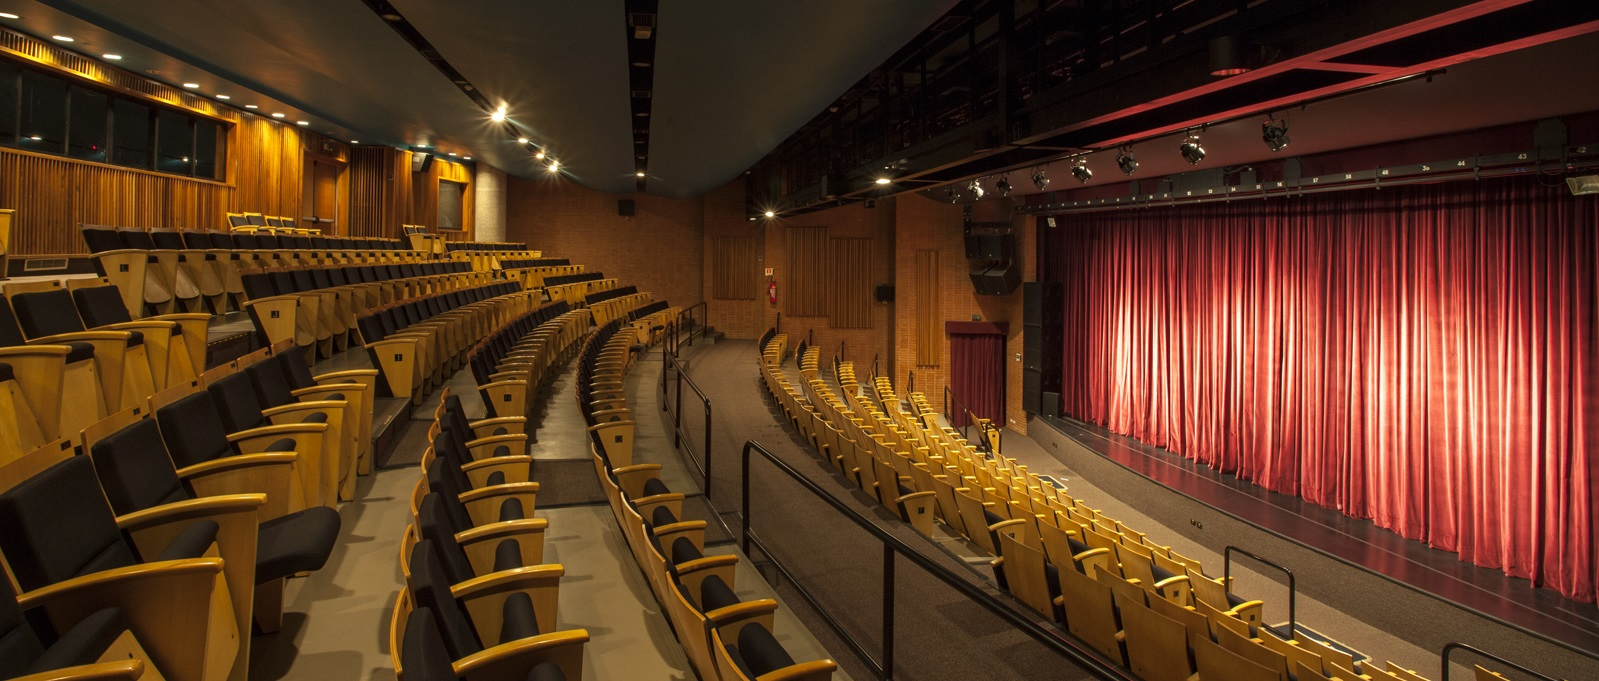 teatro1-22 santana